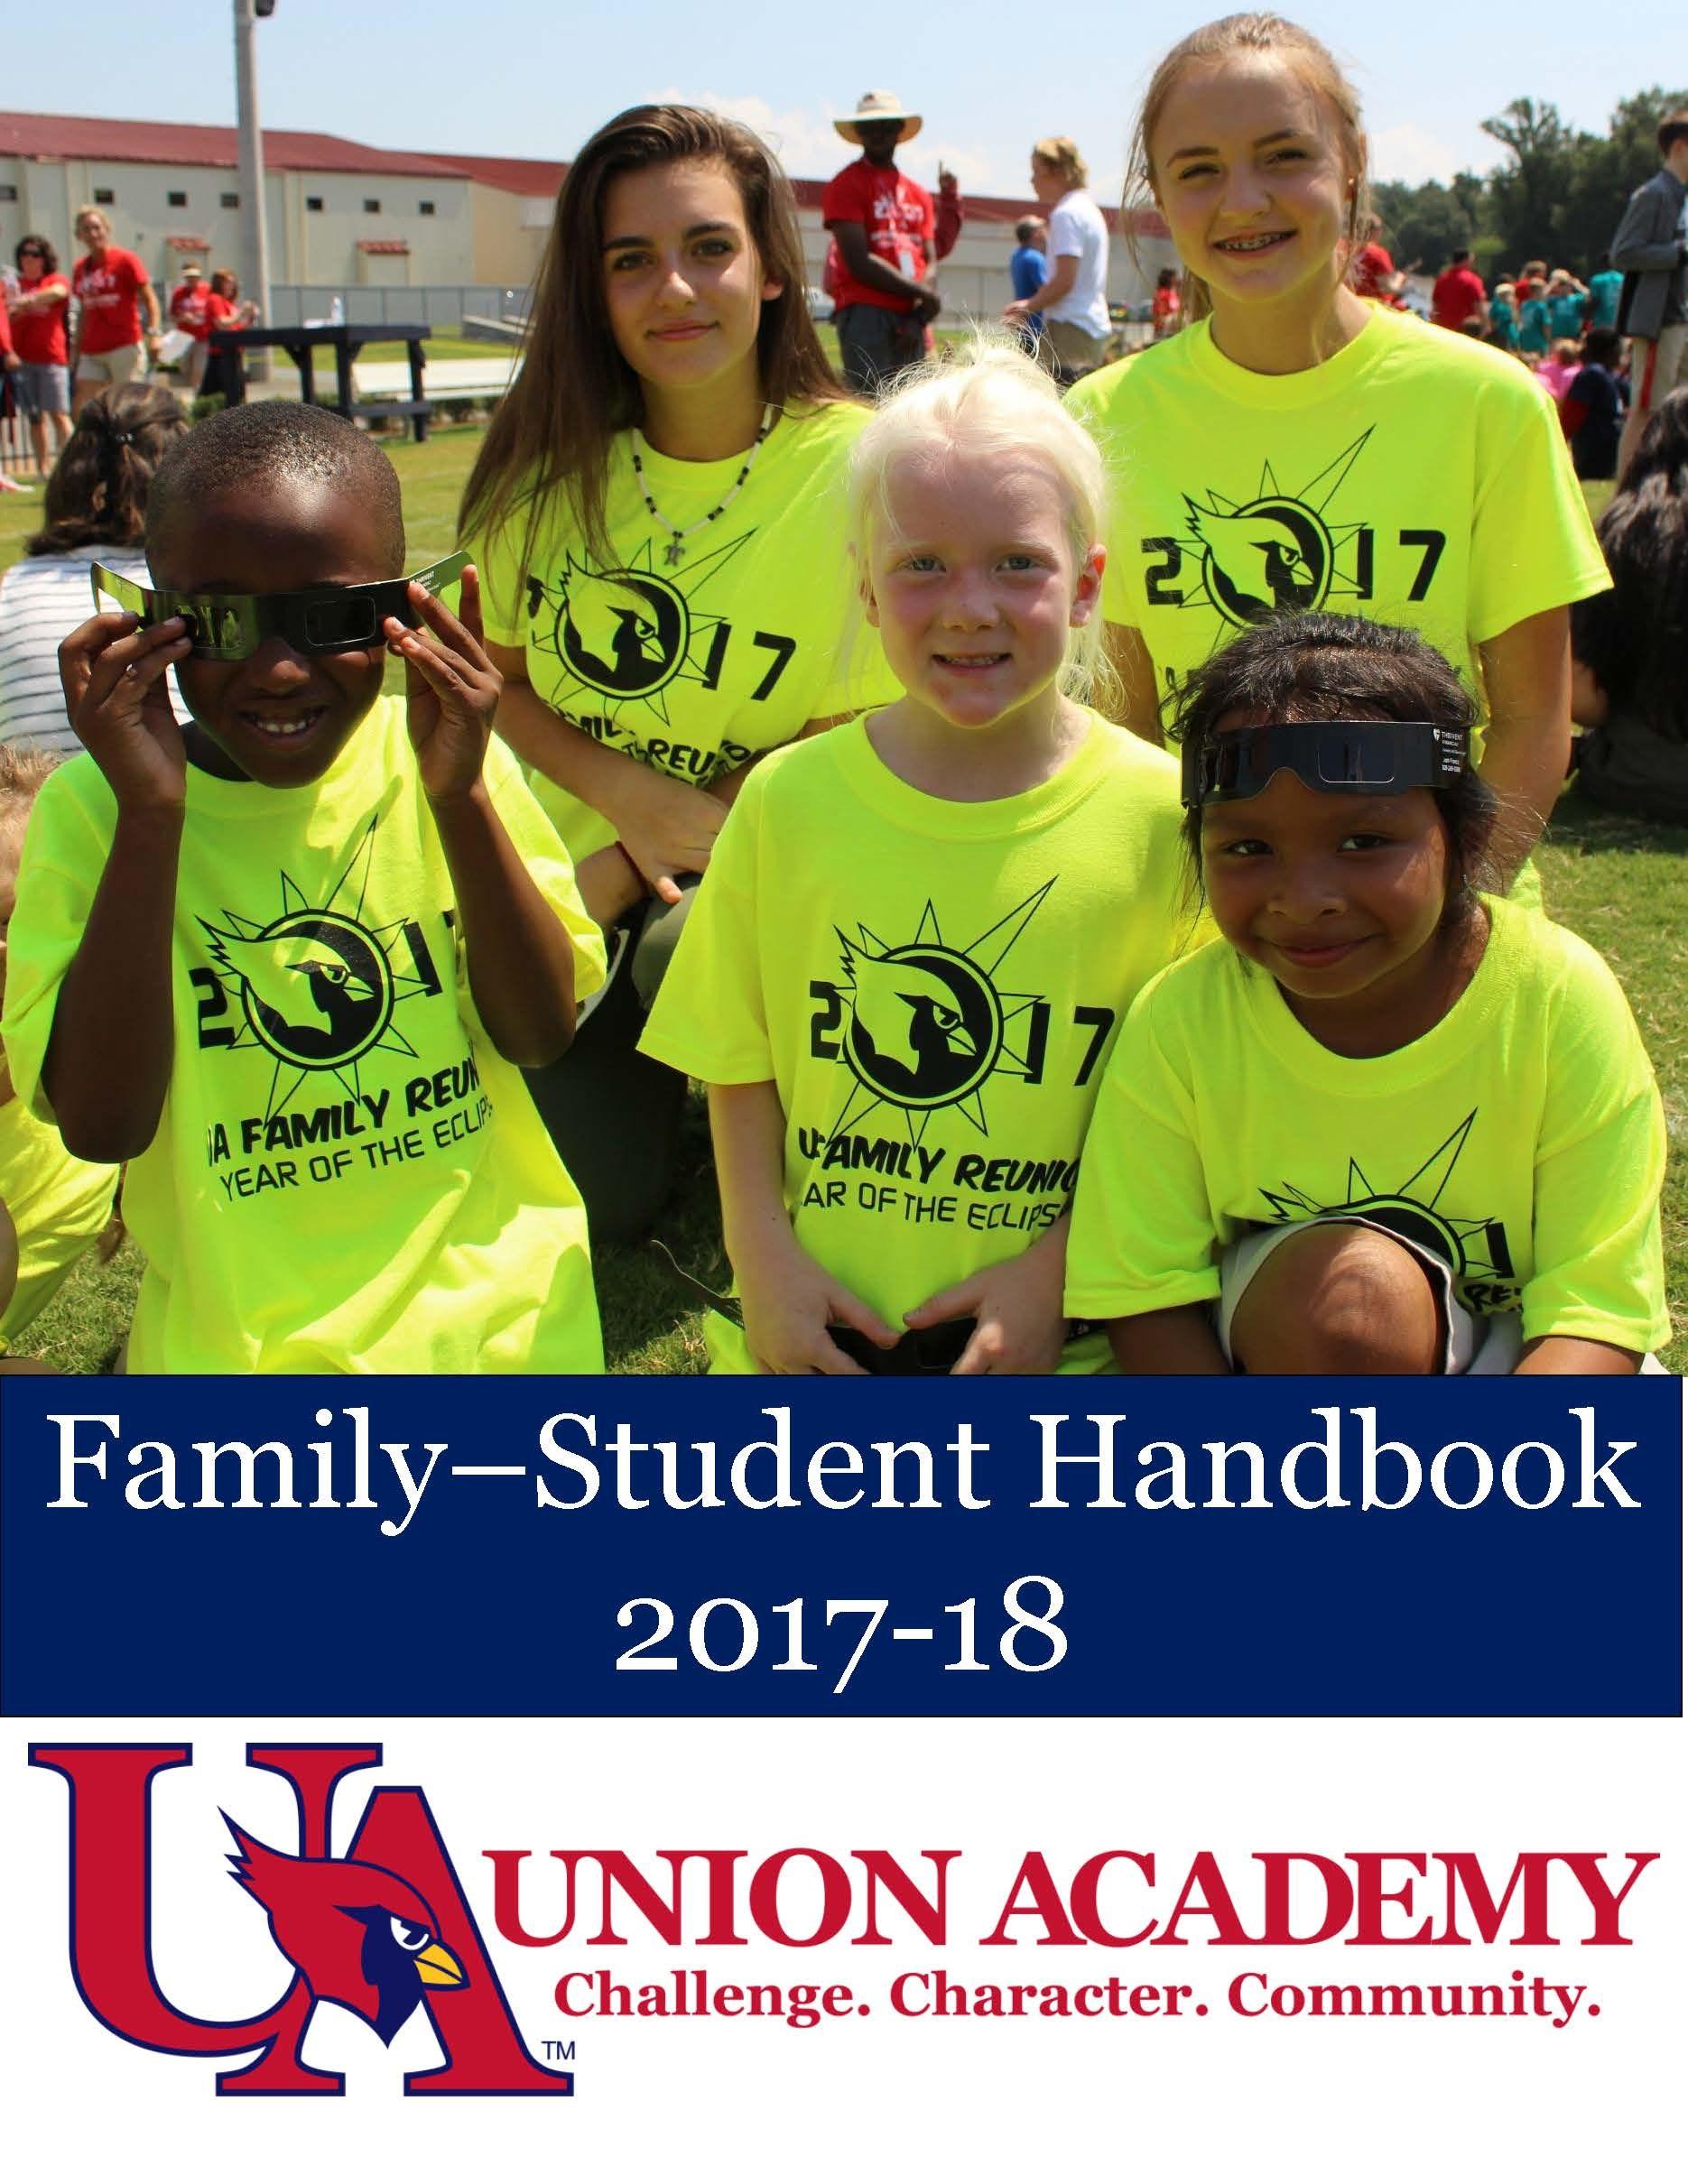 2017-18 Handbook